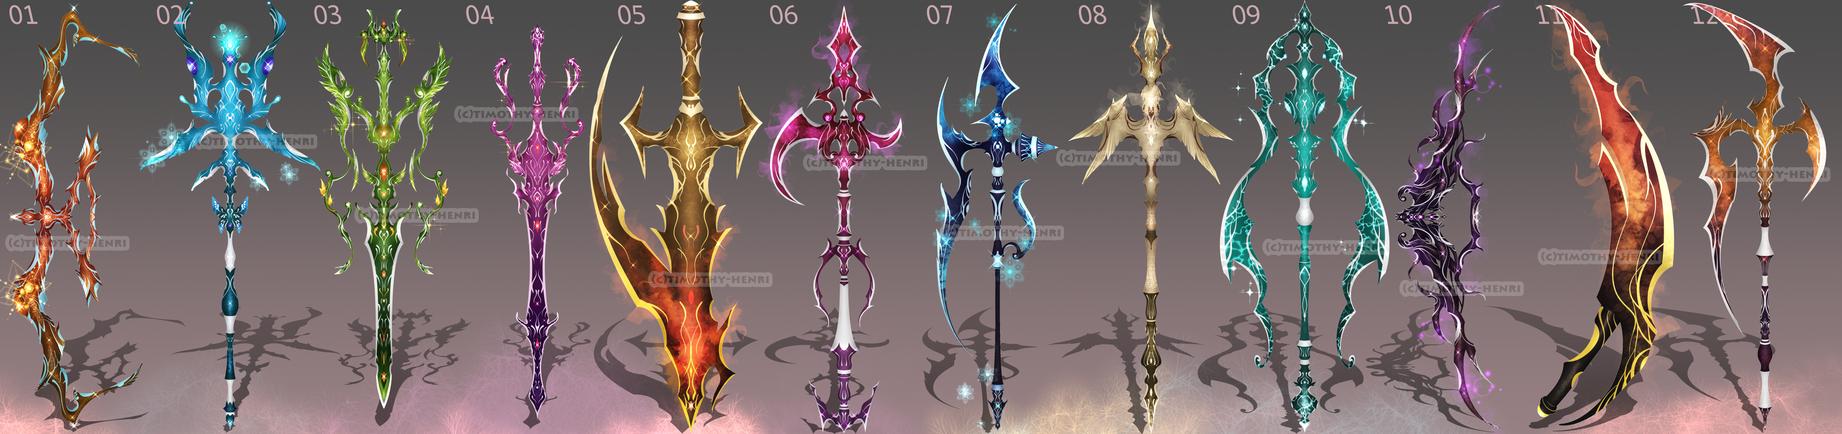 Sale weapon adoptable set by timothy henri